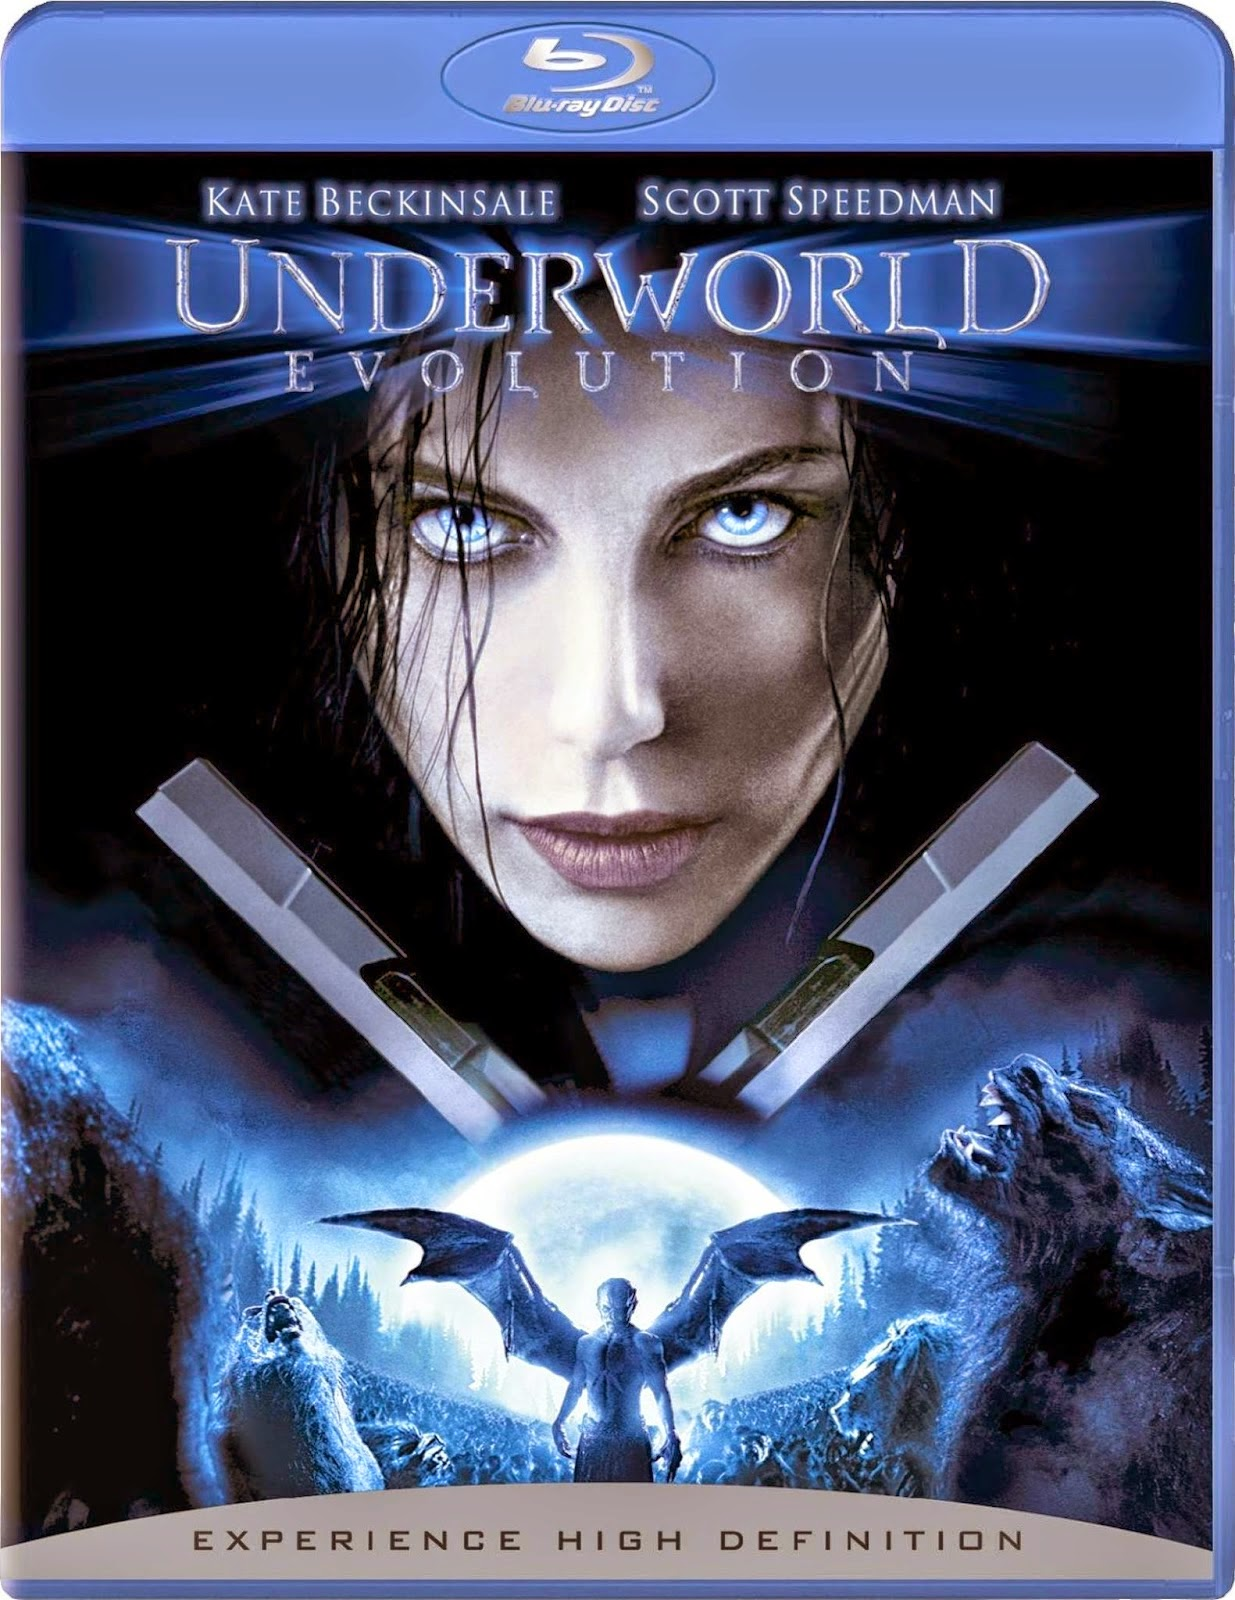 Underworld : Evolution (2006) ~ สงครามโค่นพันธุ์อสูร อีโวลูชั่น